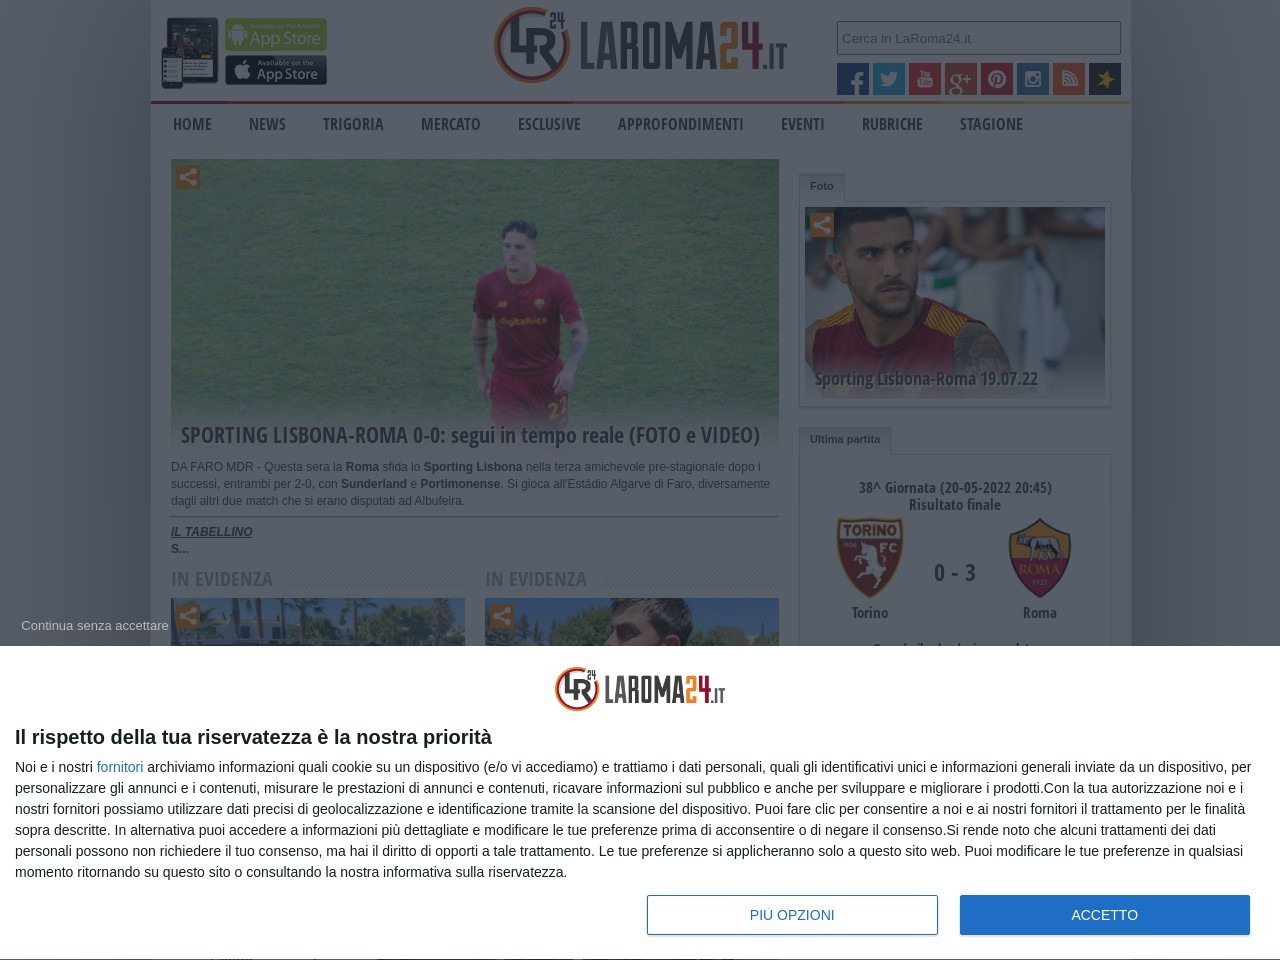 laroma24-it